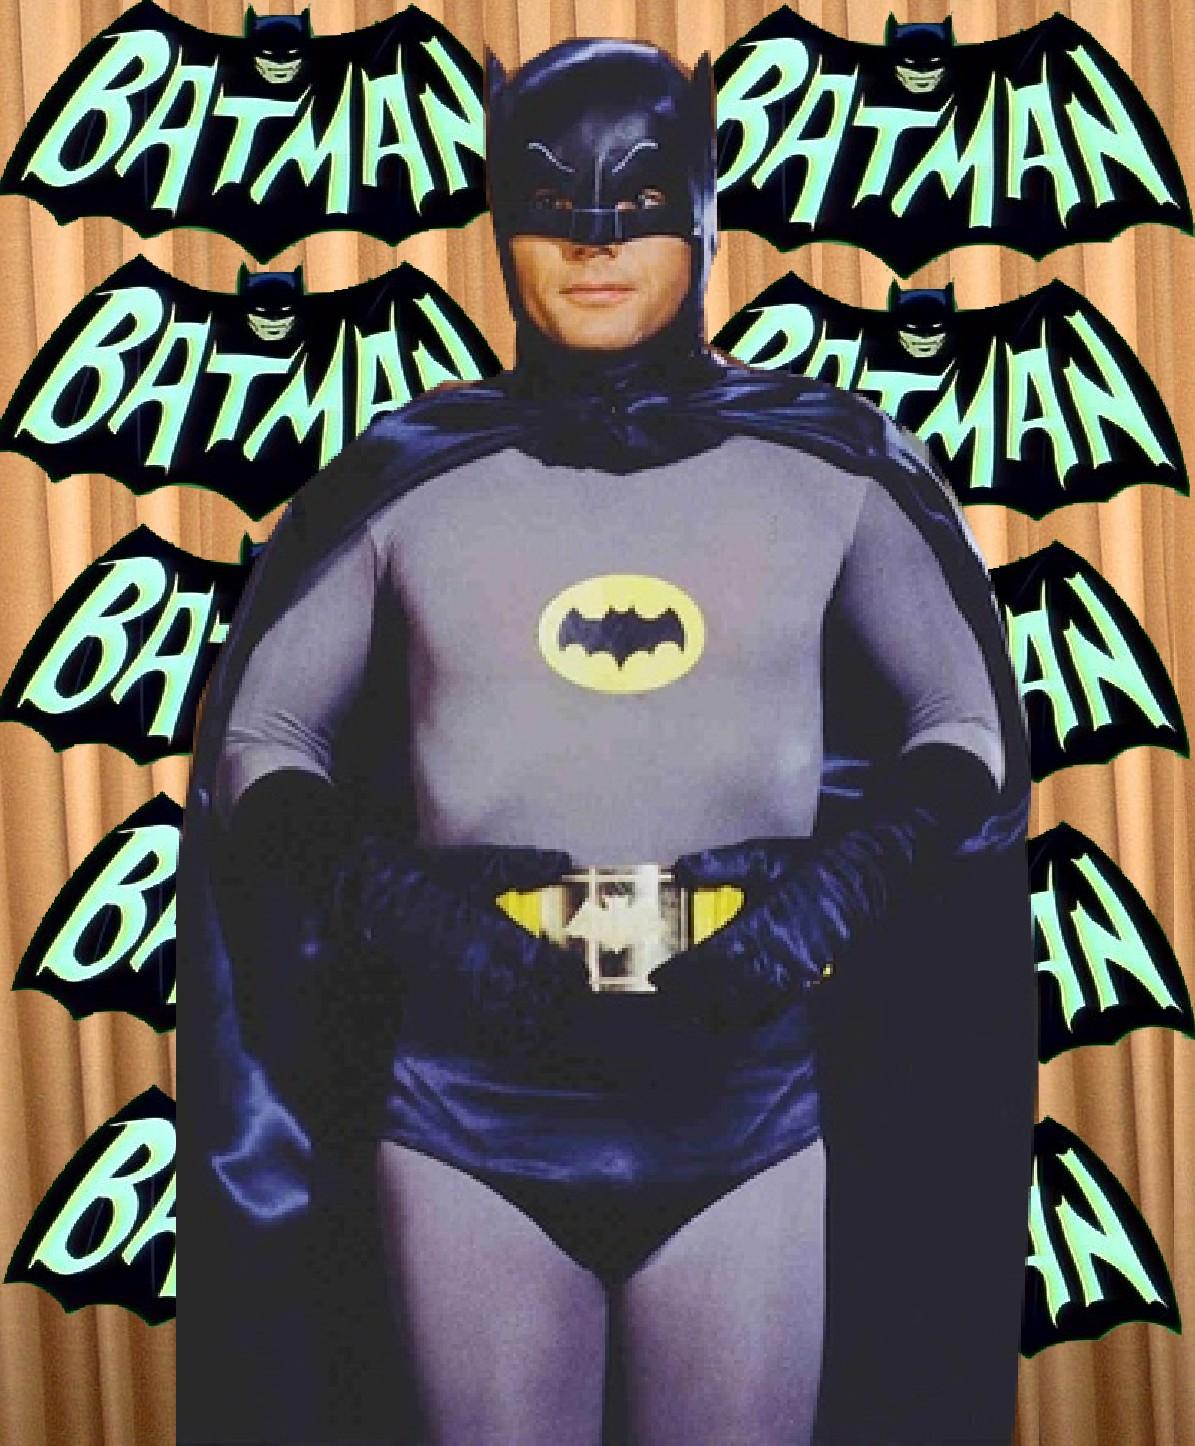 http://4.bp.blogspot.com/-FM90SP3Knks/Tn-SSeCwh5I/AAAAAAAAEmU/XUtaWfVWlhg/s1600/BATMAN+1966.jpg